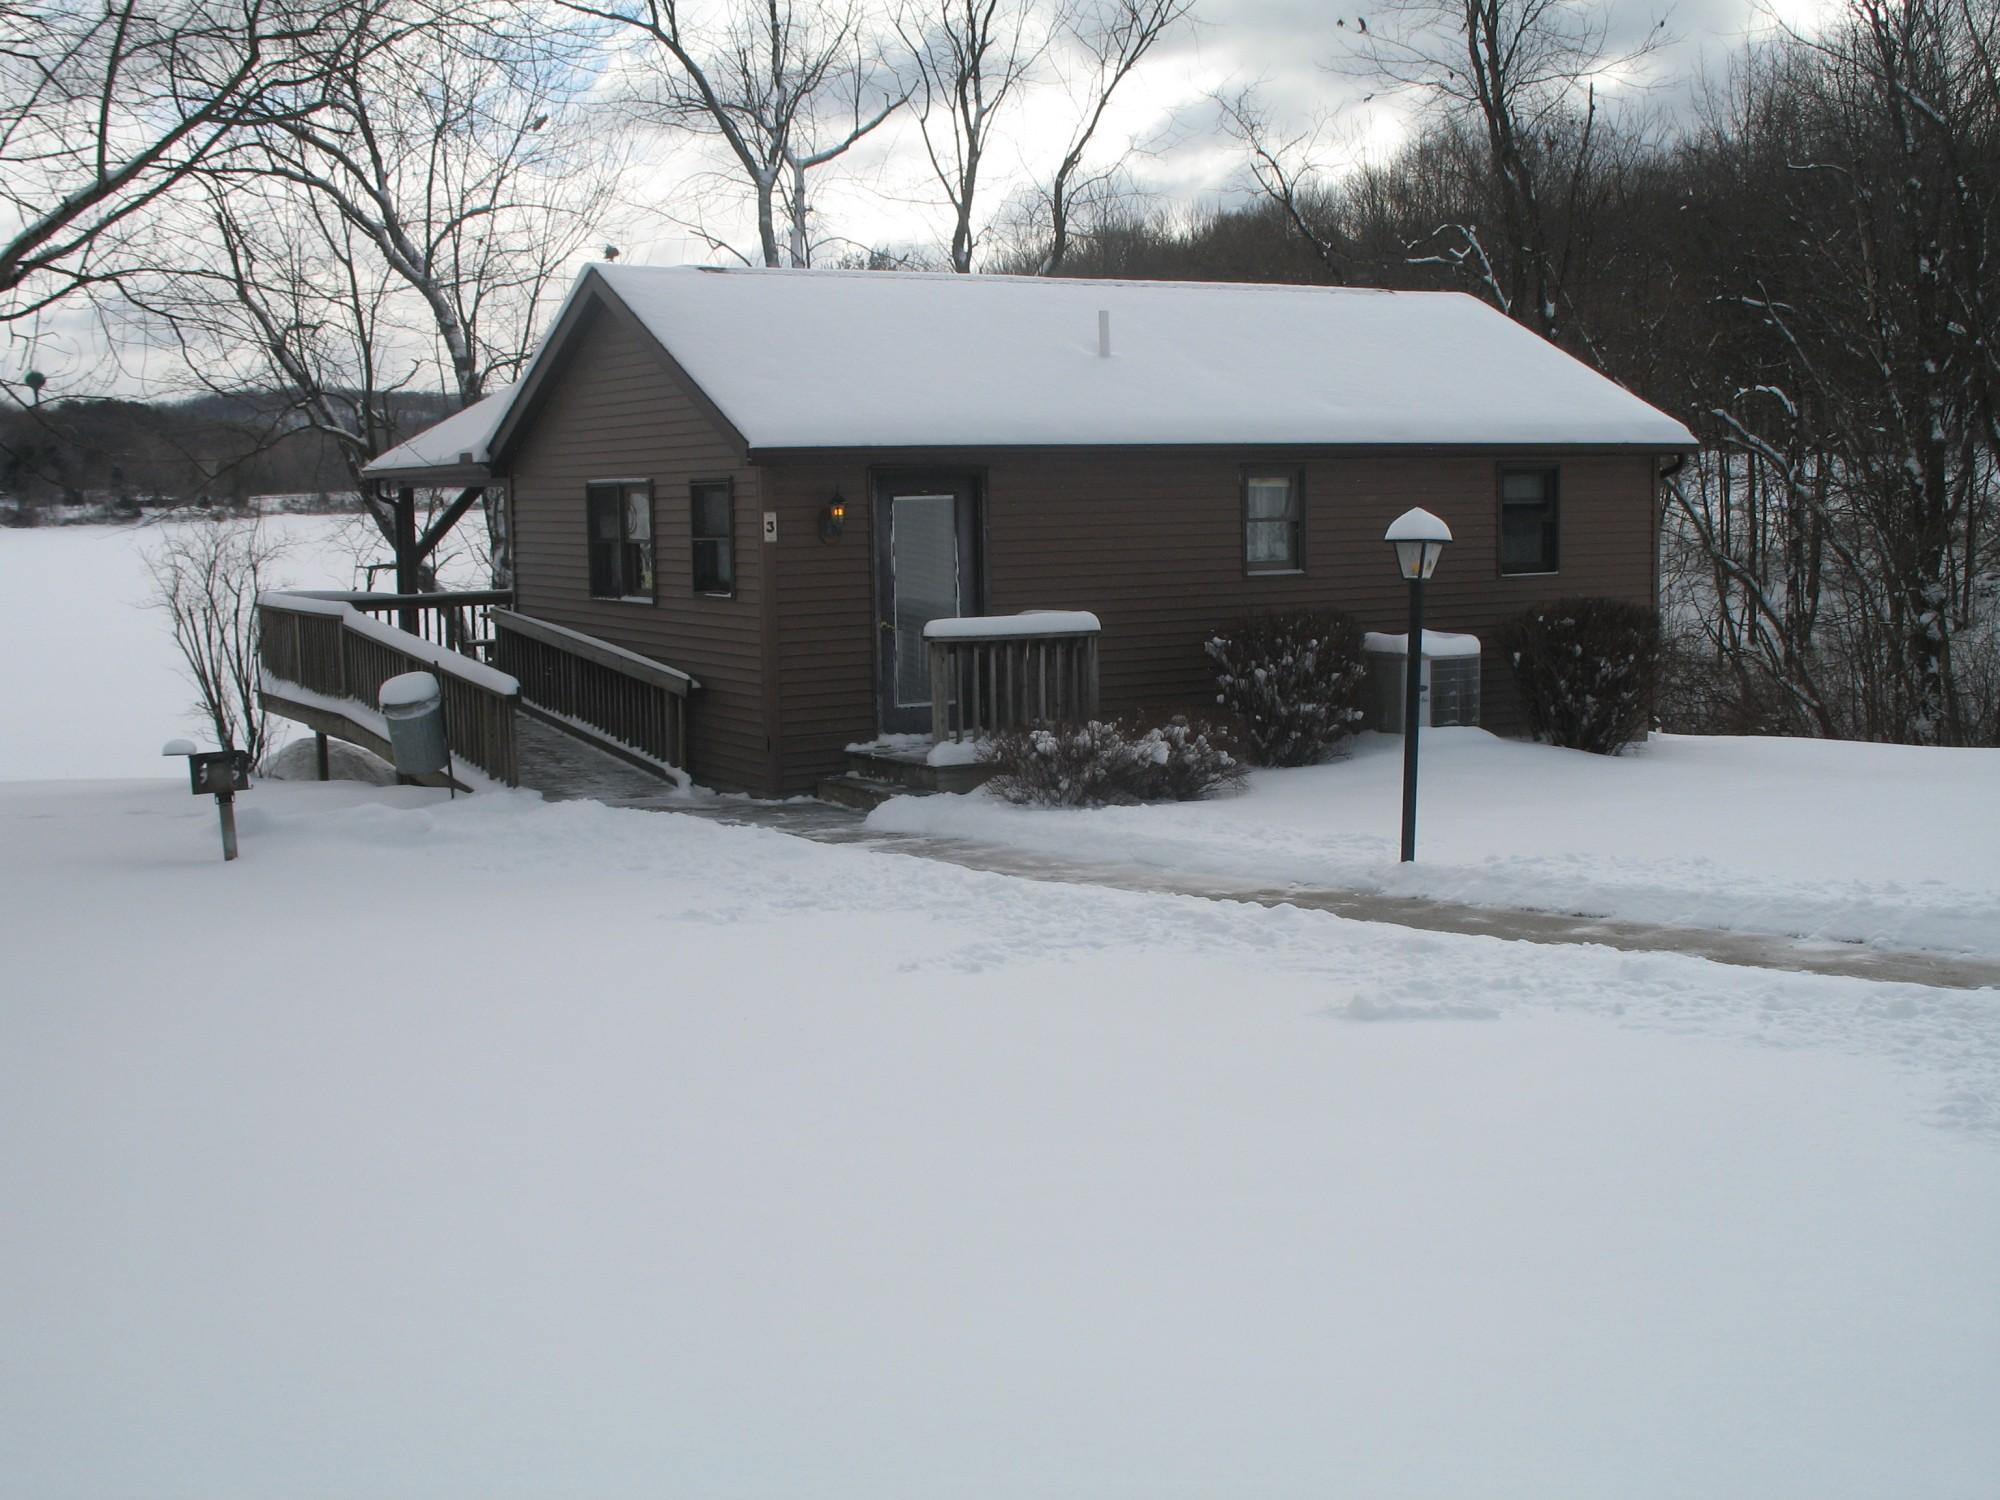 bear rentals lake creek cabin cabins crossing properties ohio locations resort